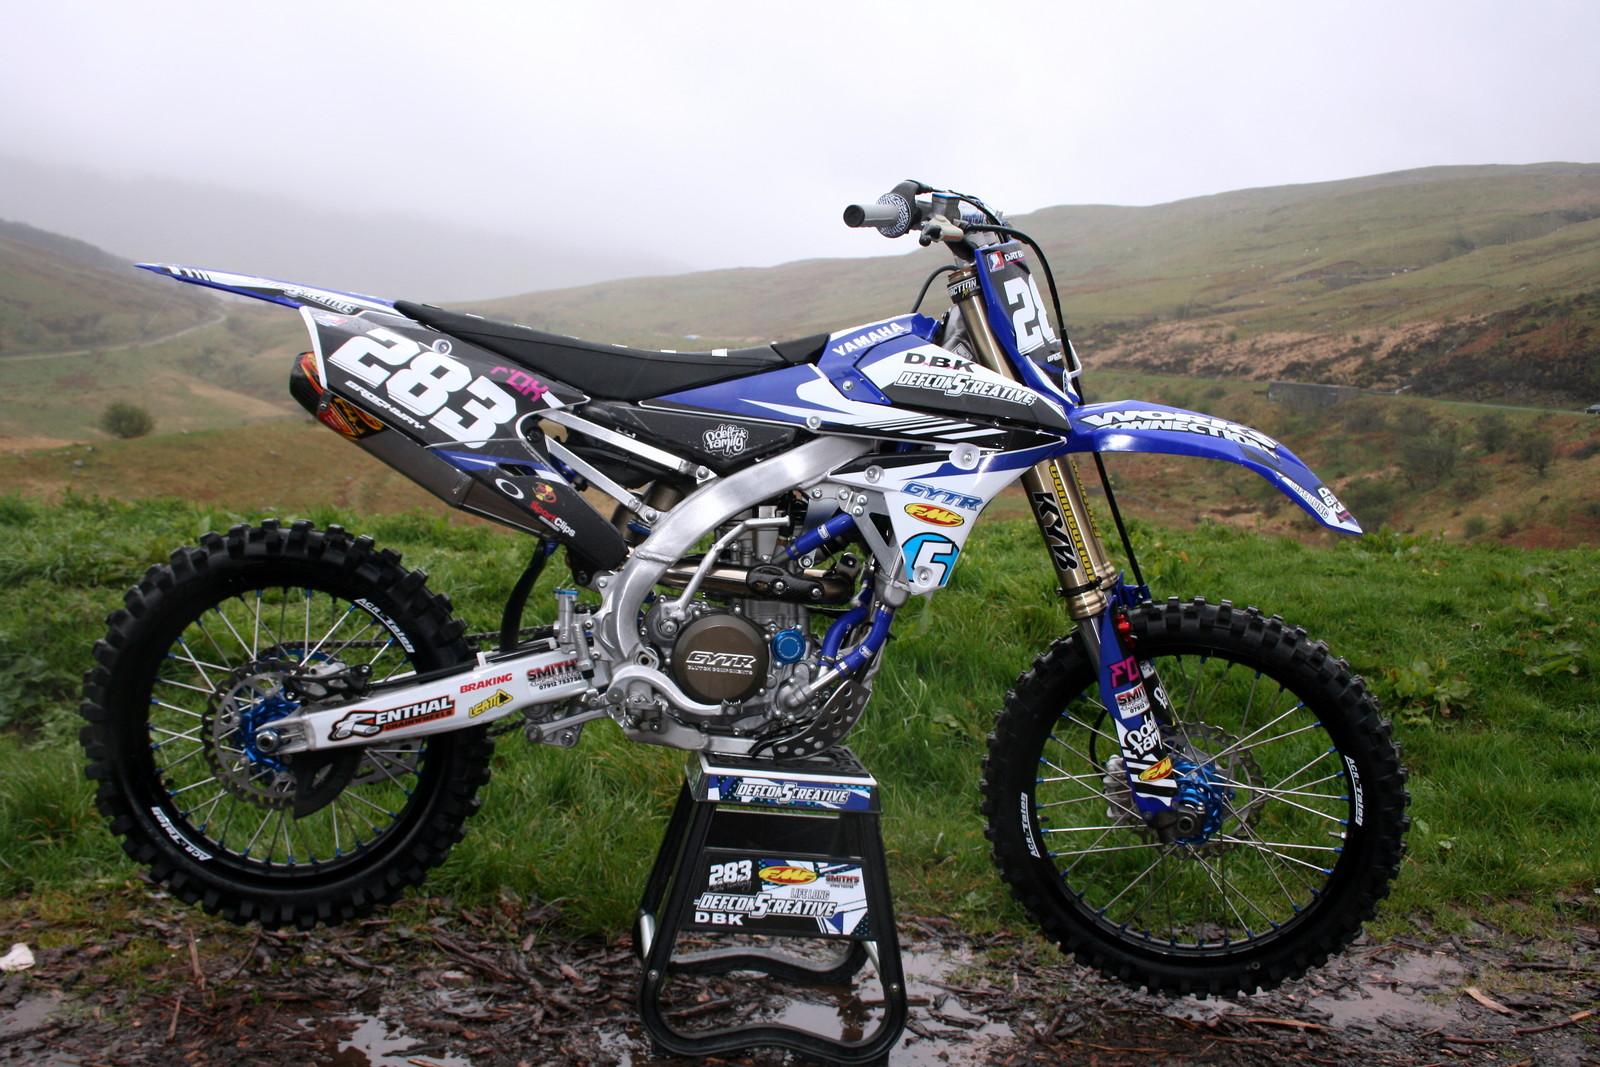 Yamaha Acr Black